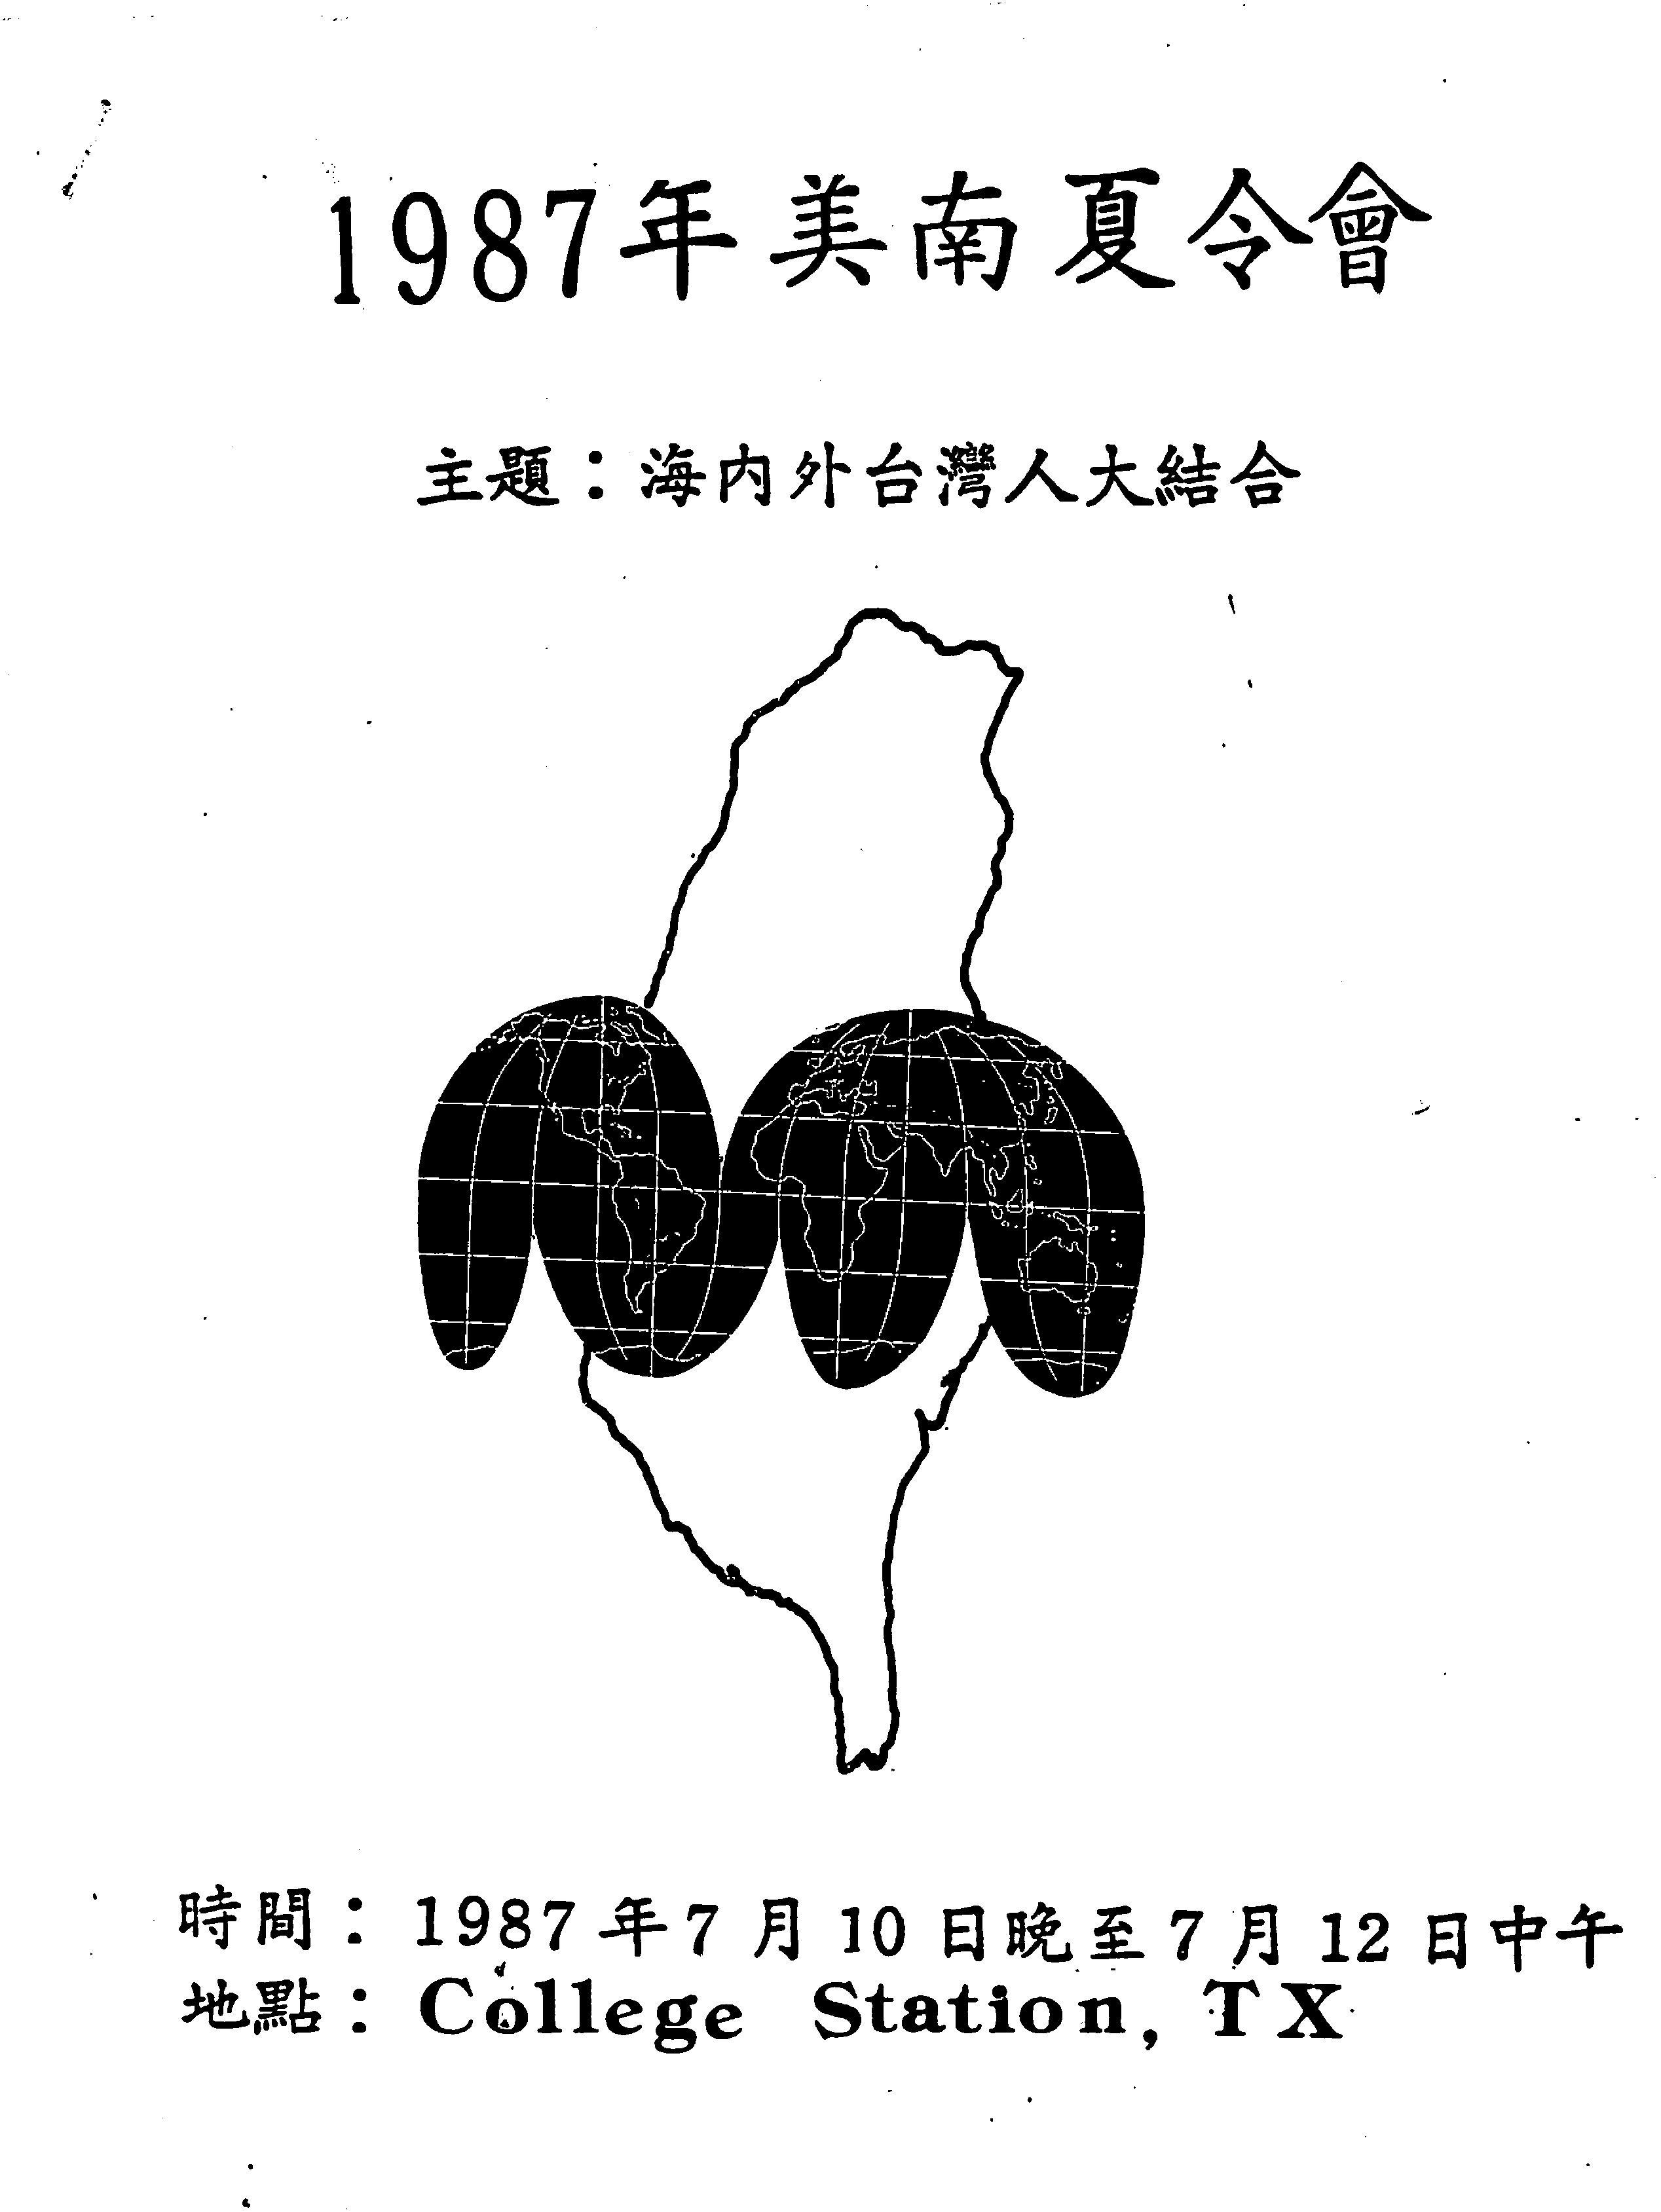 TACSR 1987